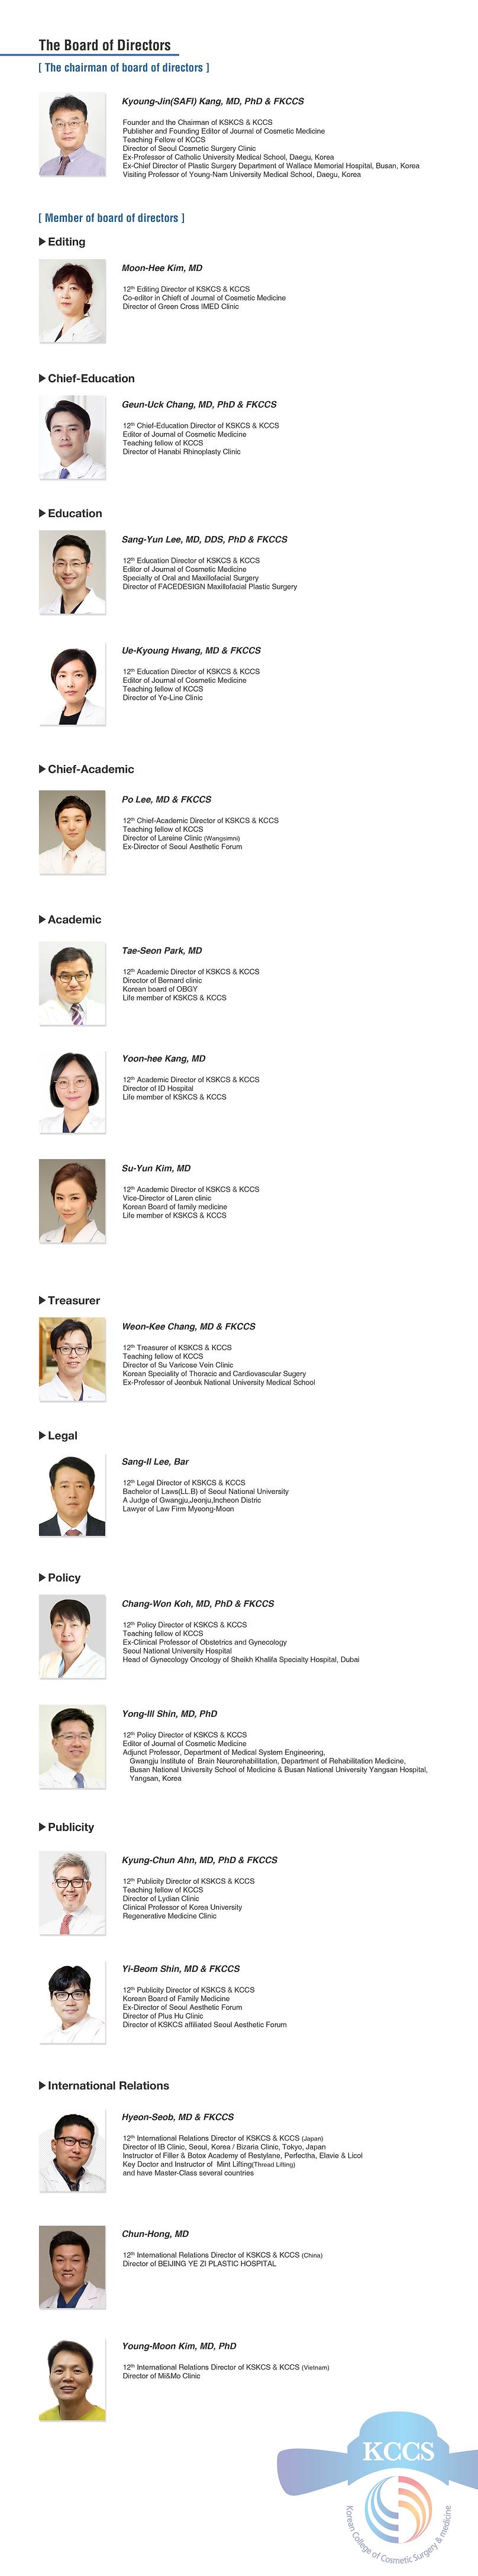 renew_board_of_director_2.png